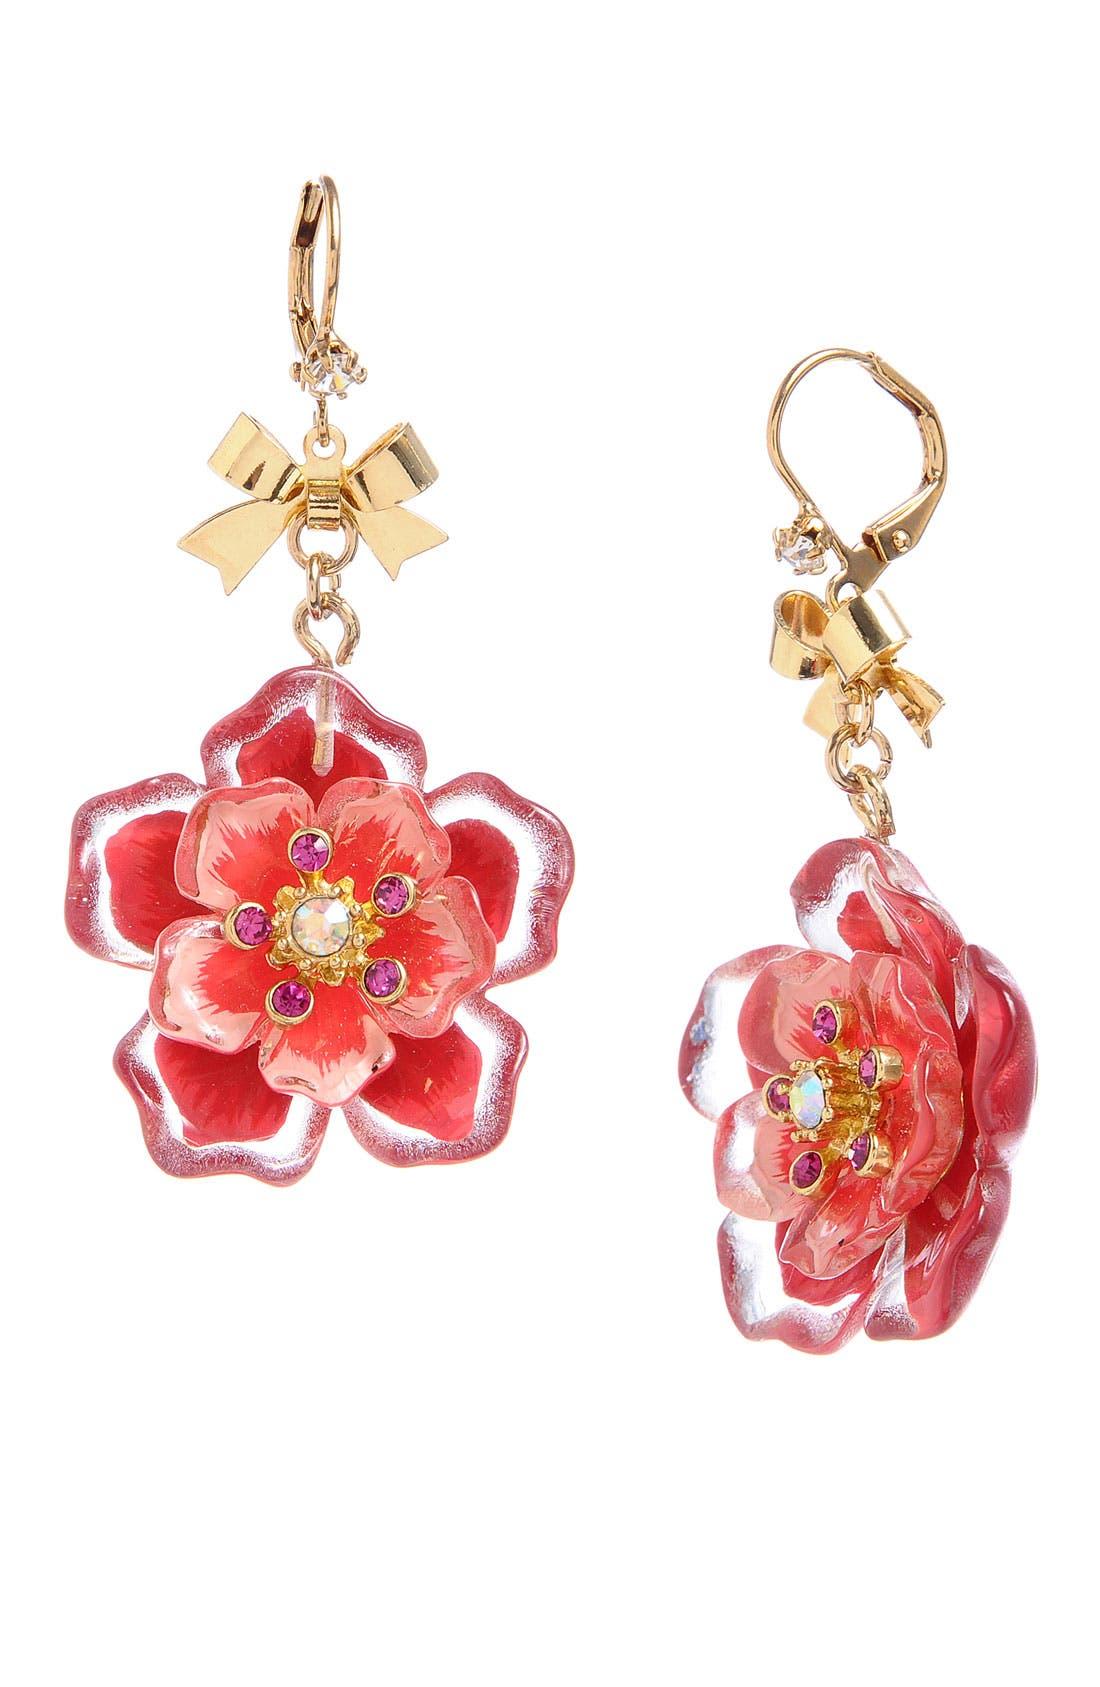 Alternate Image 1 Selected - Betsey Johnson 'Hawaiian Luau' Floral Drop Earrings